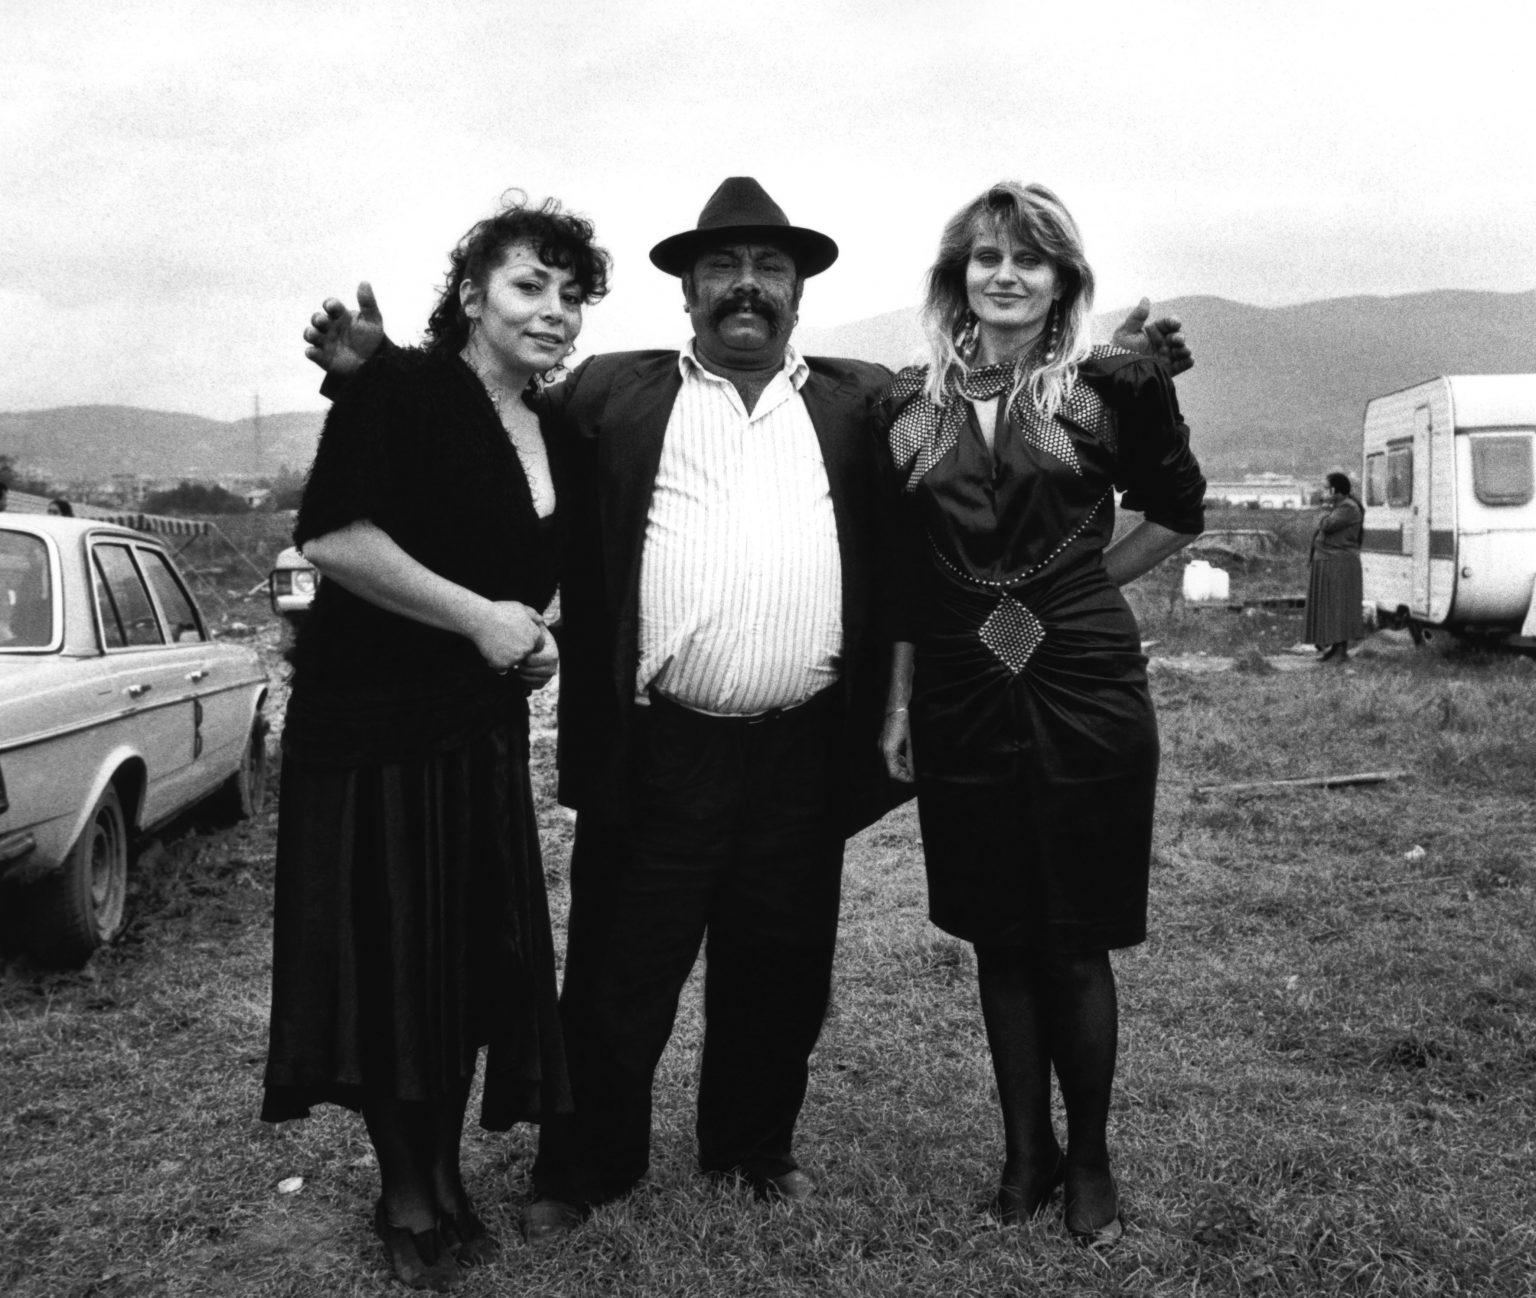 Florence , 1993 - Nomads' camp >< Firenze , 1993 - Campo nomadi